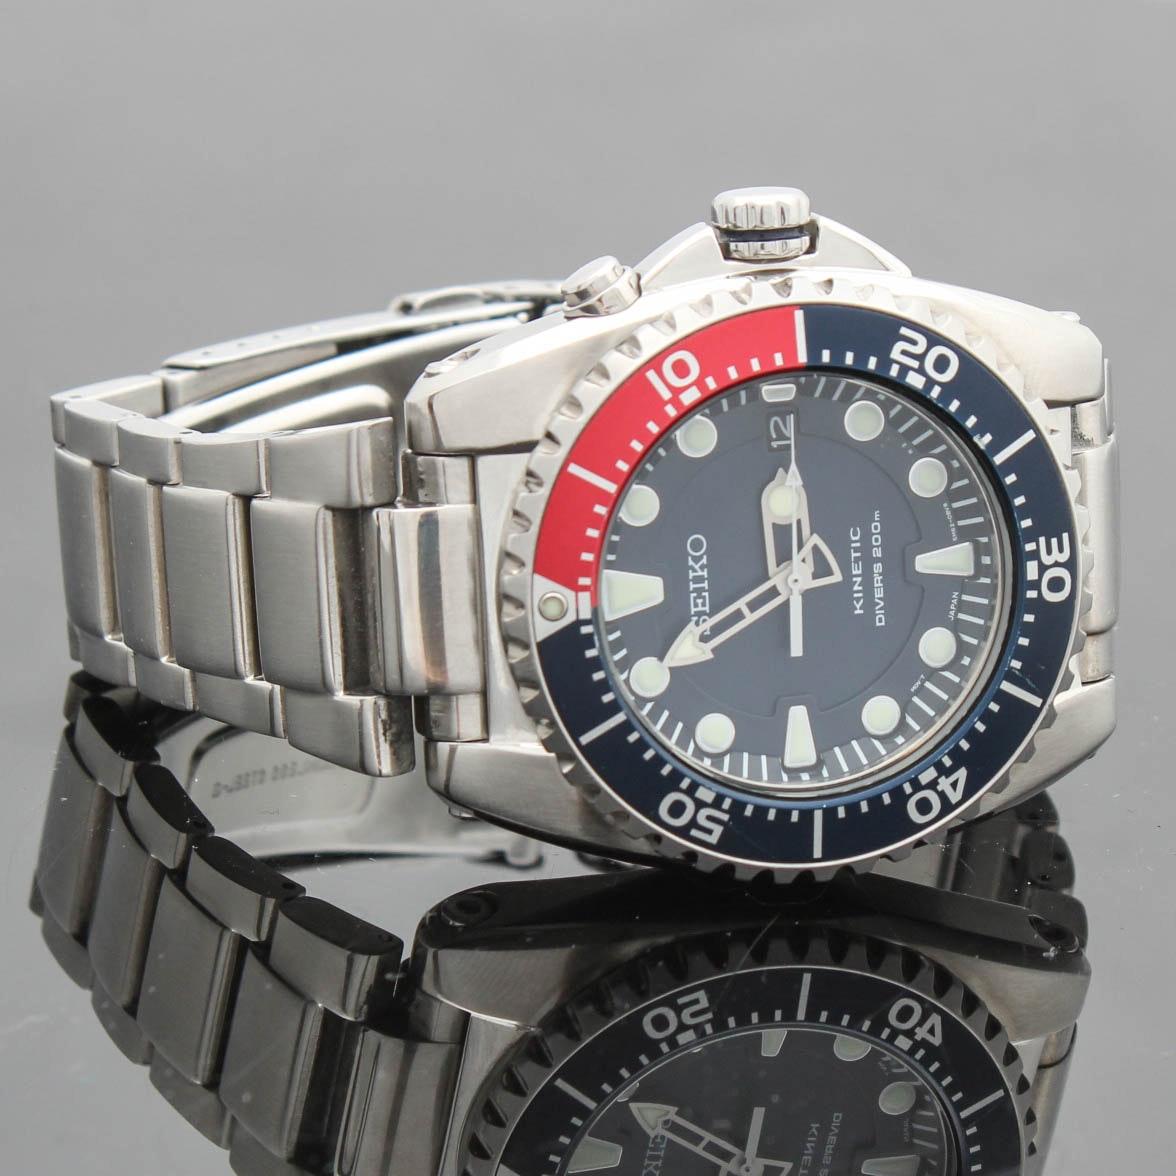 Seiko Kinetic Quartz Movement Diver's Wristwatch